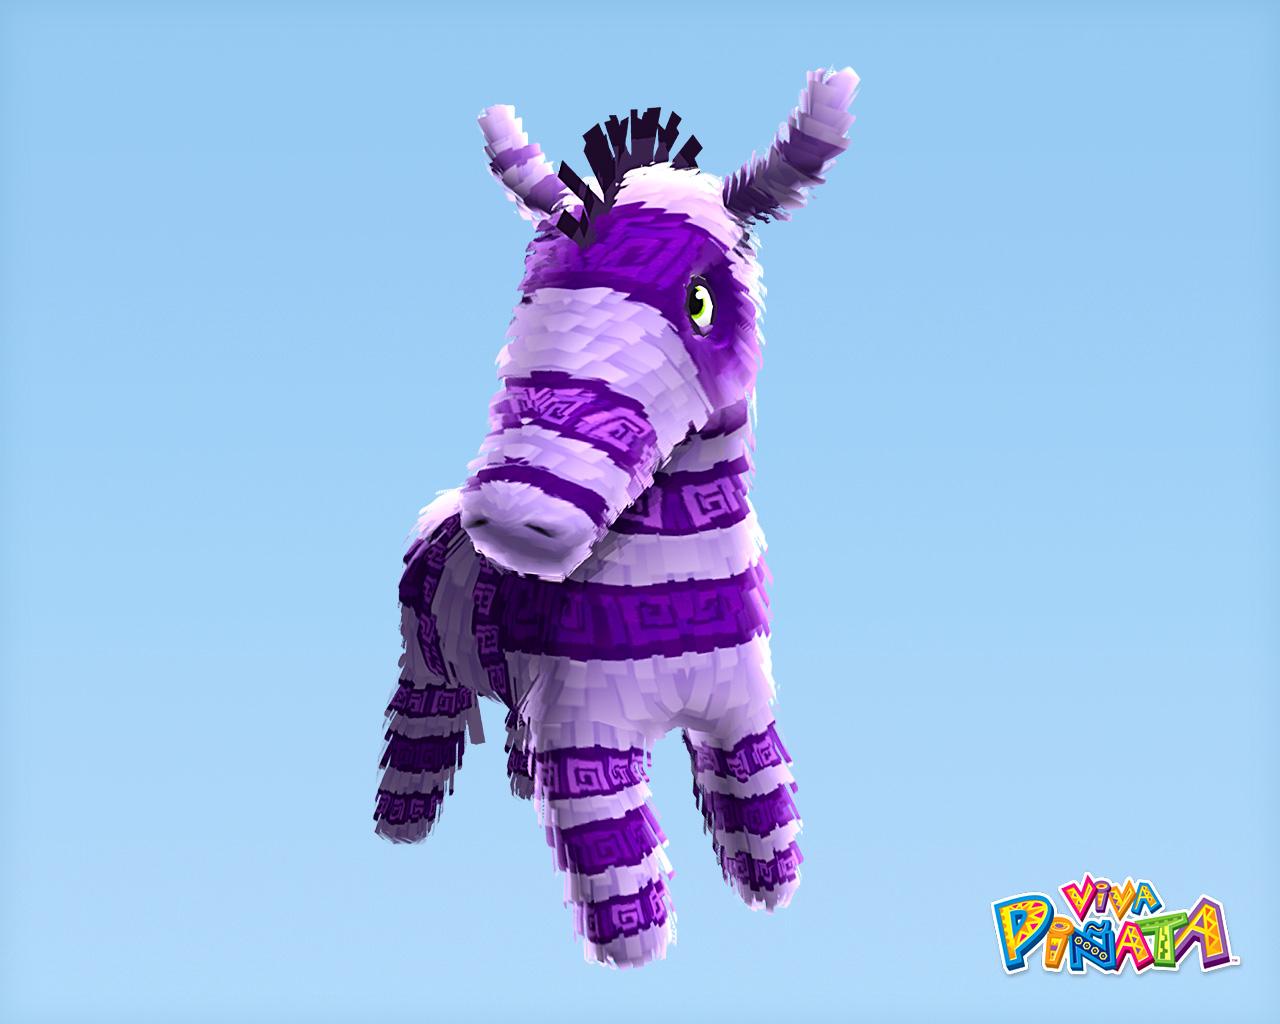 Viva Piñata   All The Tropes Wiki   FANDOM powered by Wikia